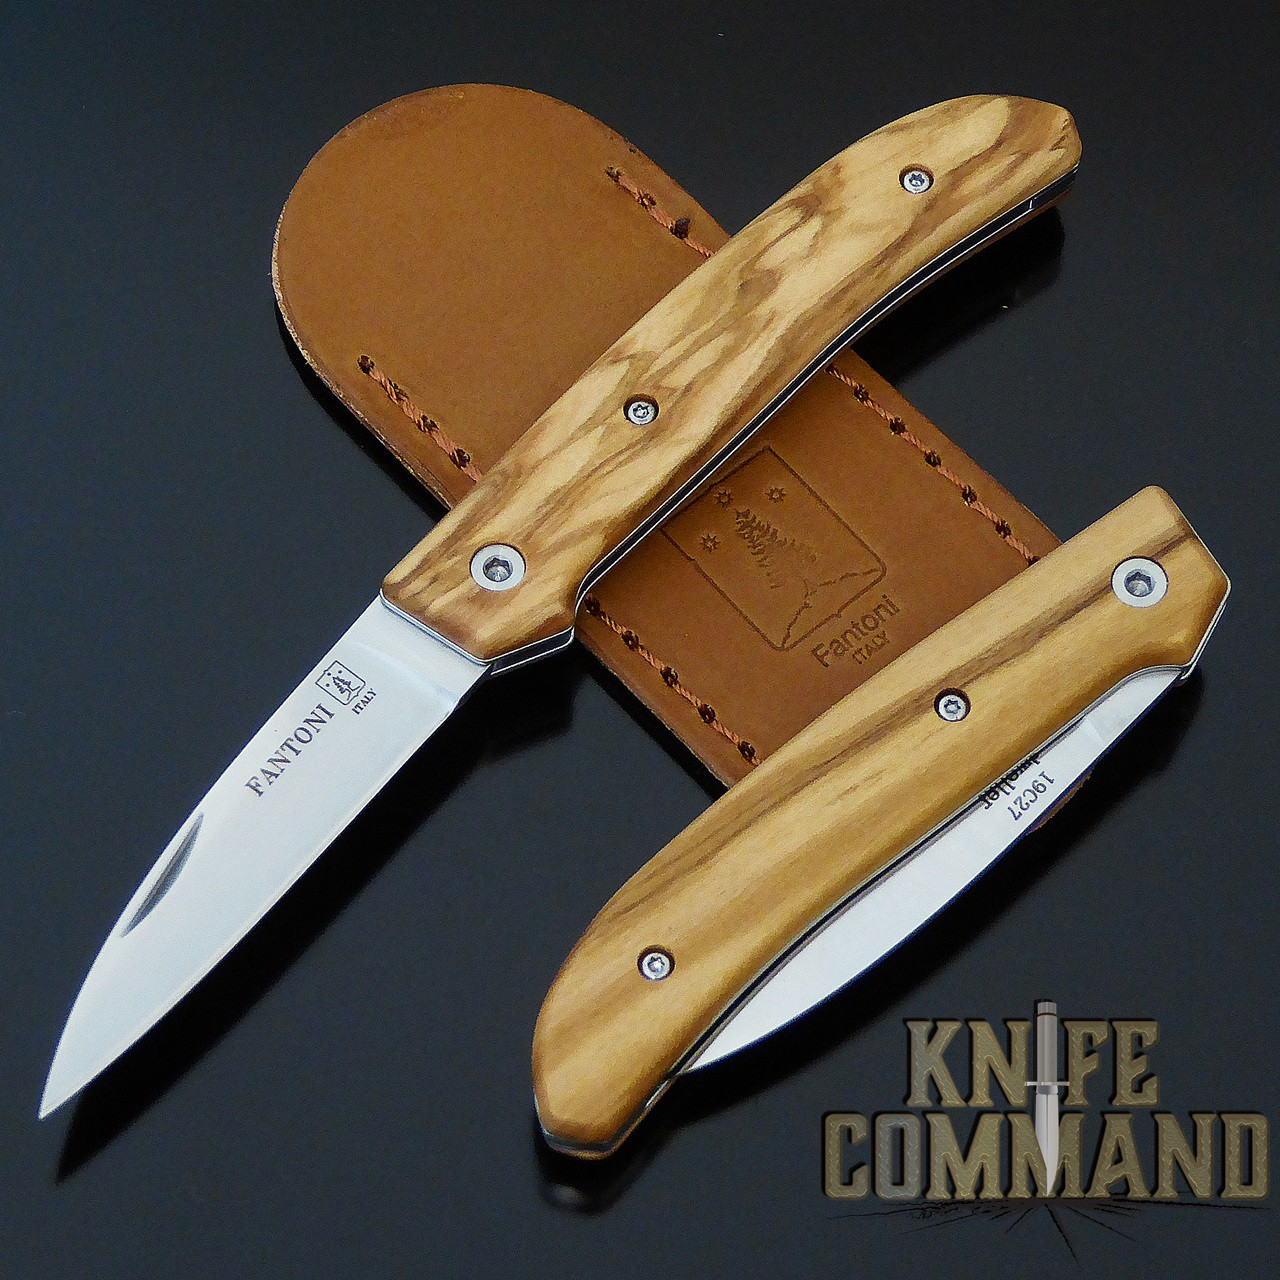 Fantoni Dweller Olive S Italian Made Slip-joint EDC Pocket Knife.  Top quality Olive Wood handles.